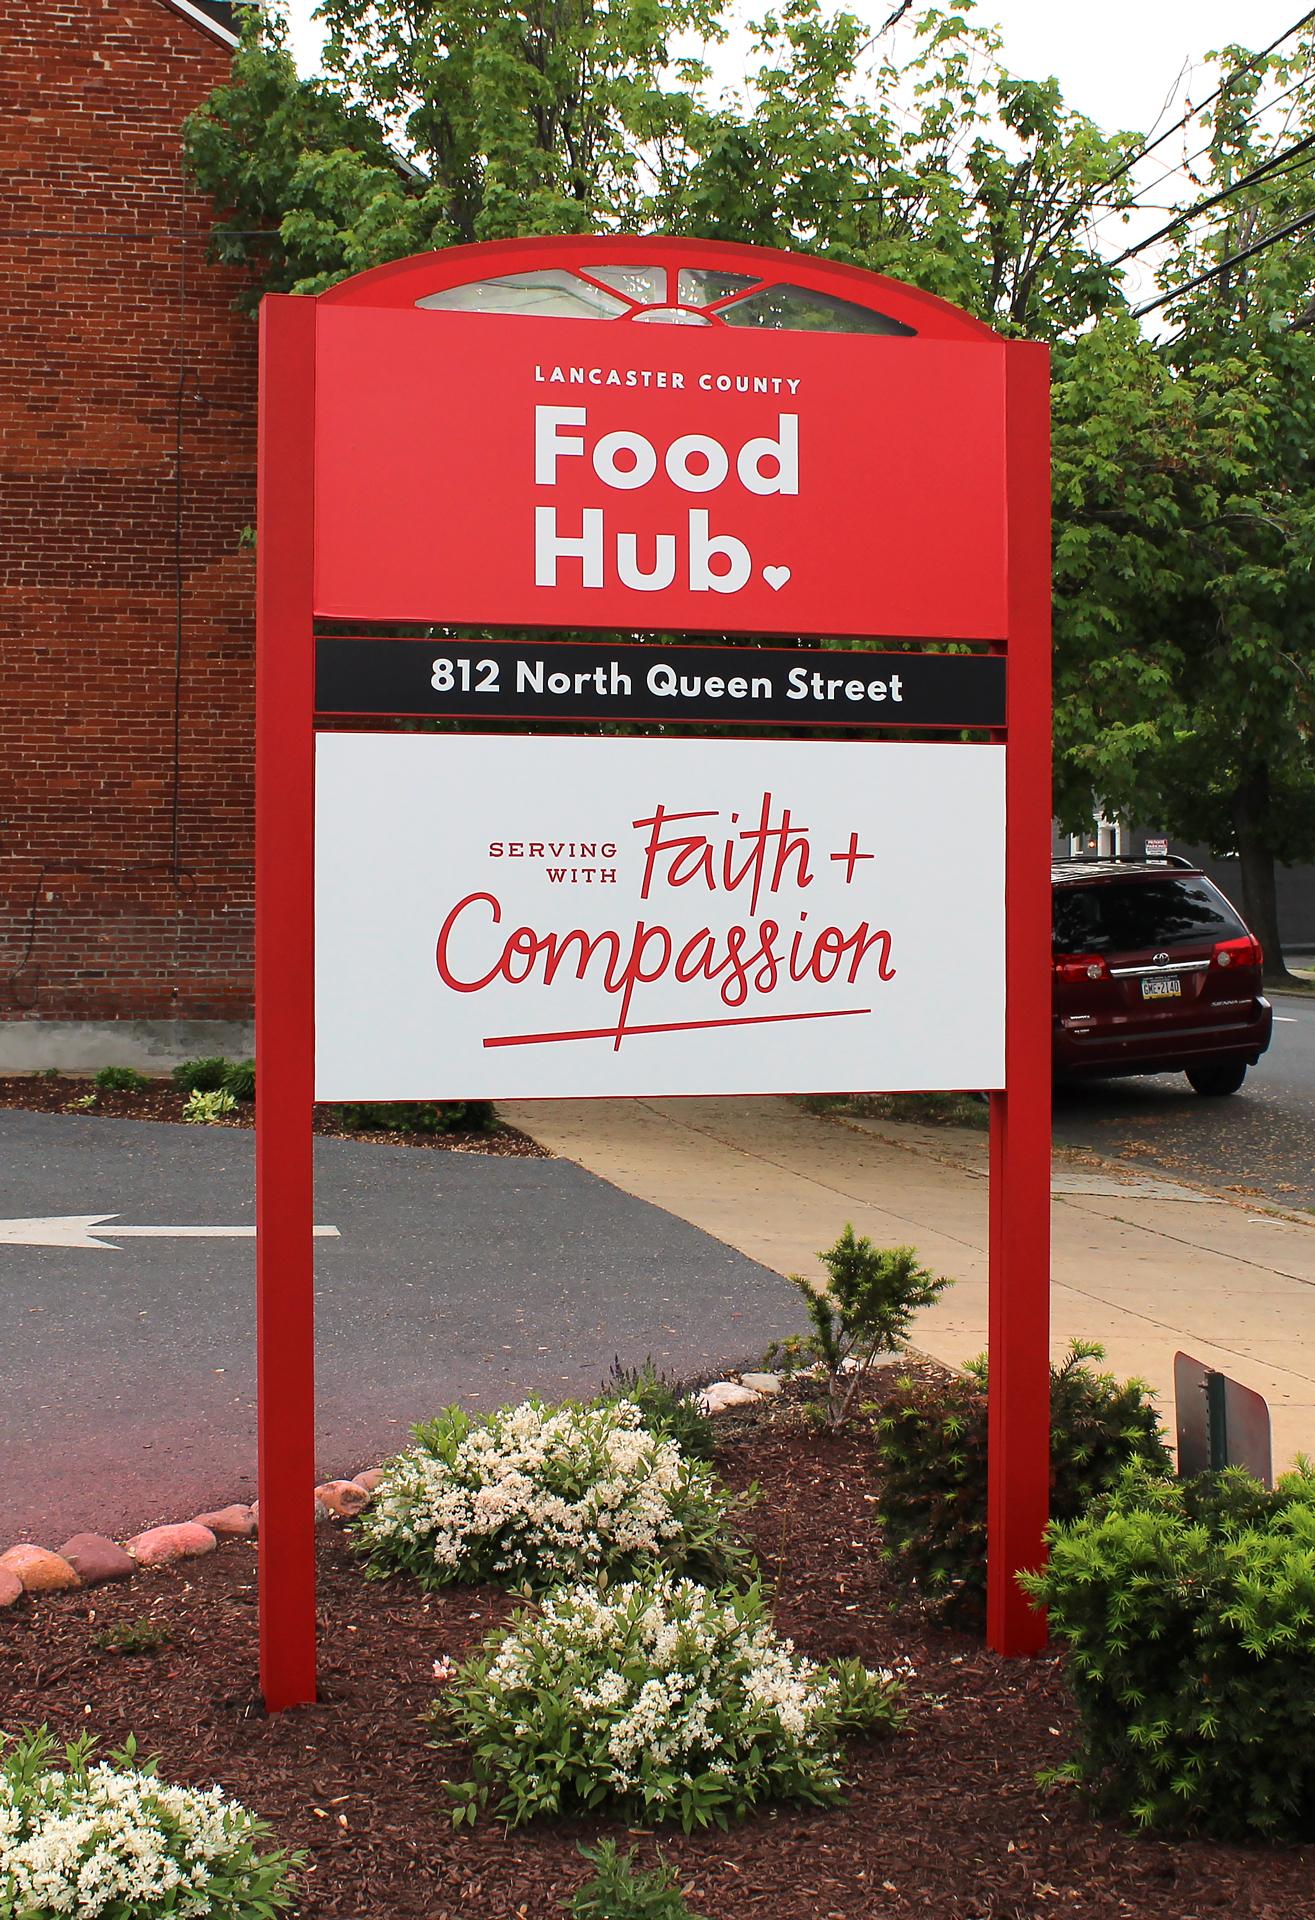 Lancaster County Food Hub